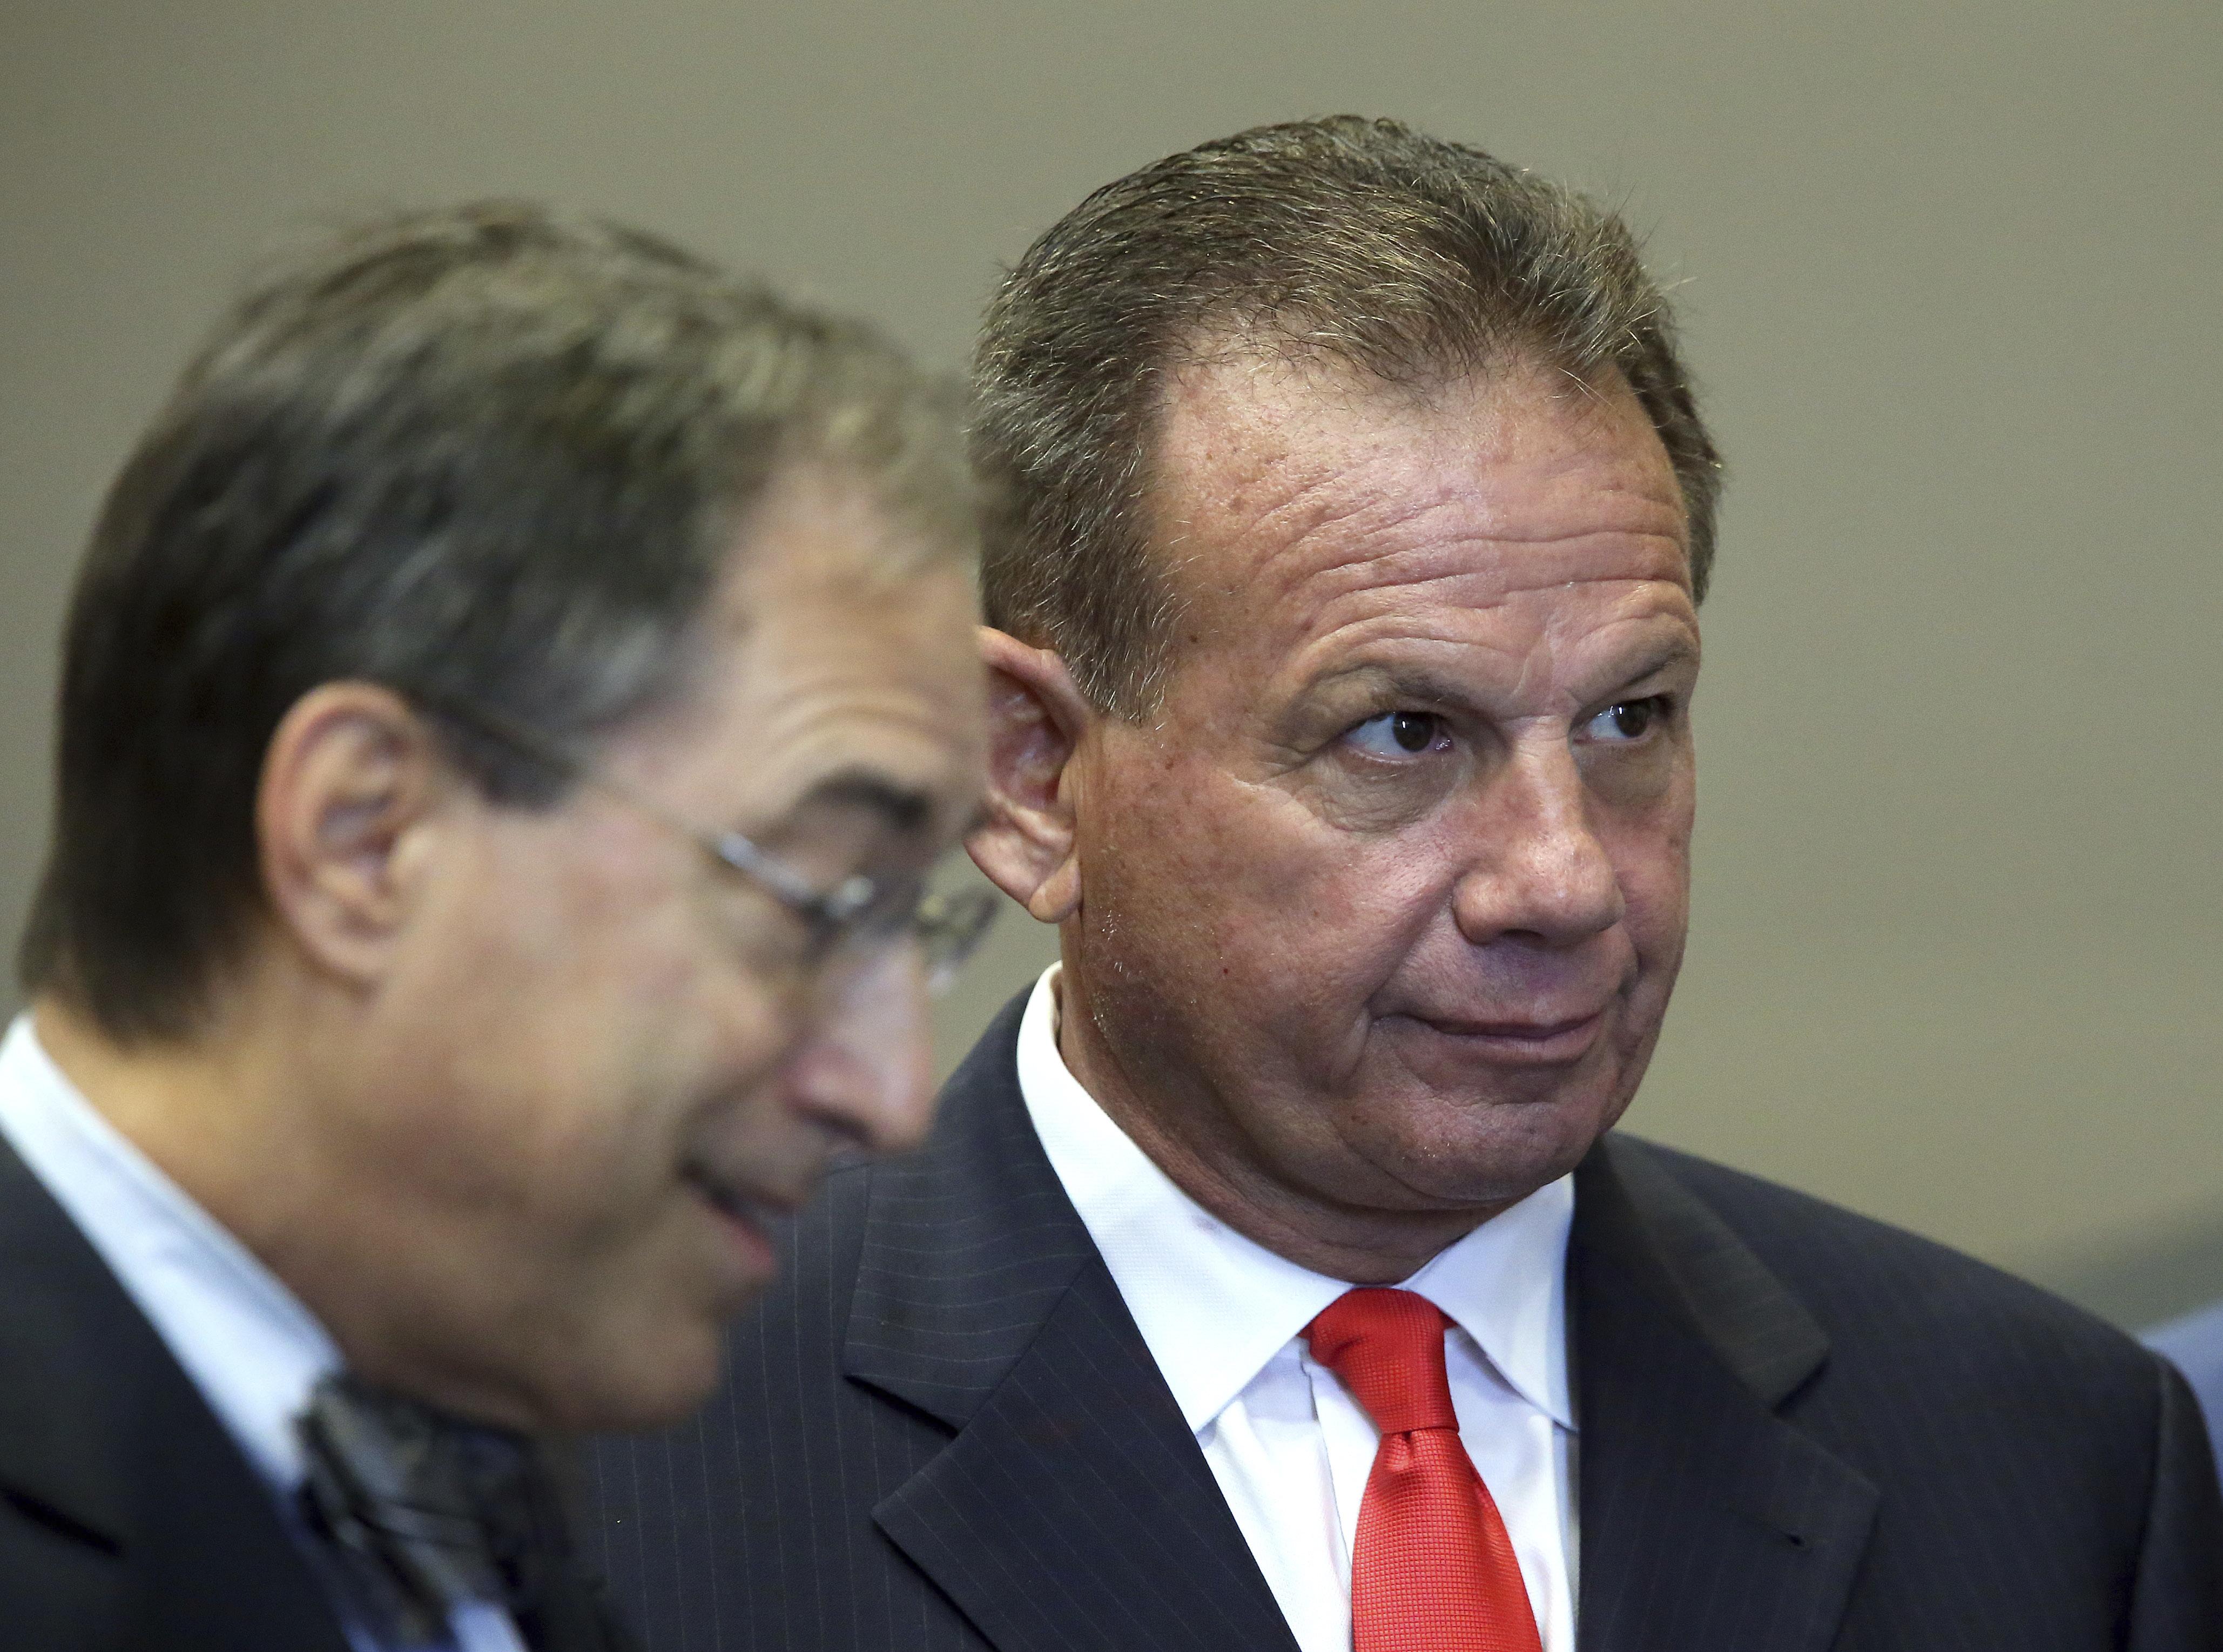 Panel backs removal of sheriff over school shooting response